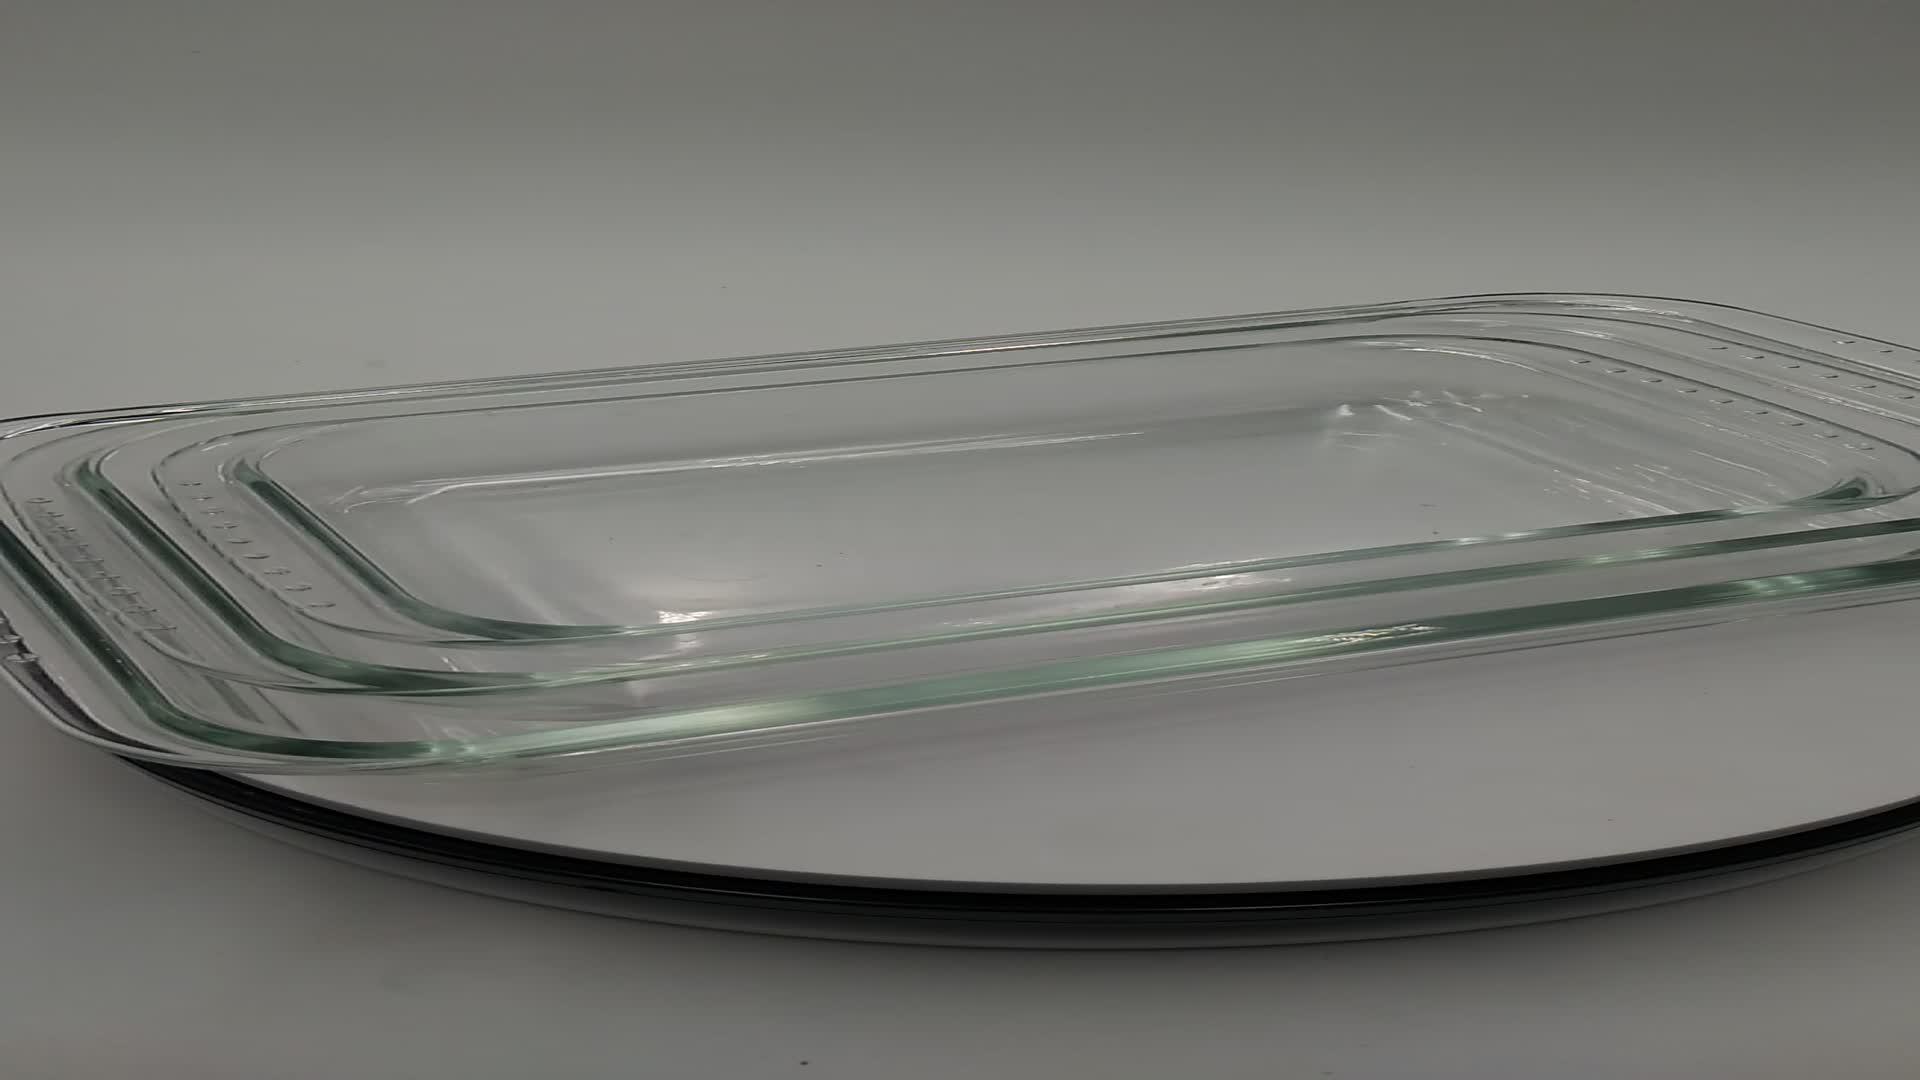 Cao thủy tinh Borosilicate ovenware an toàn baking tấm/Hình Chữ Nhật Borosilicate glass baking pan bakeware 0.8L-4L